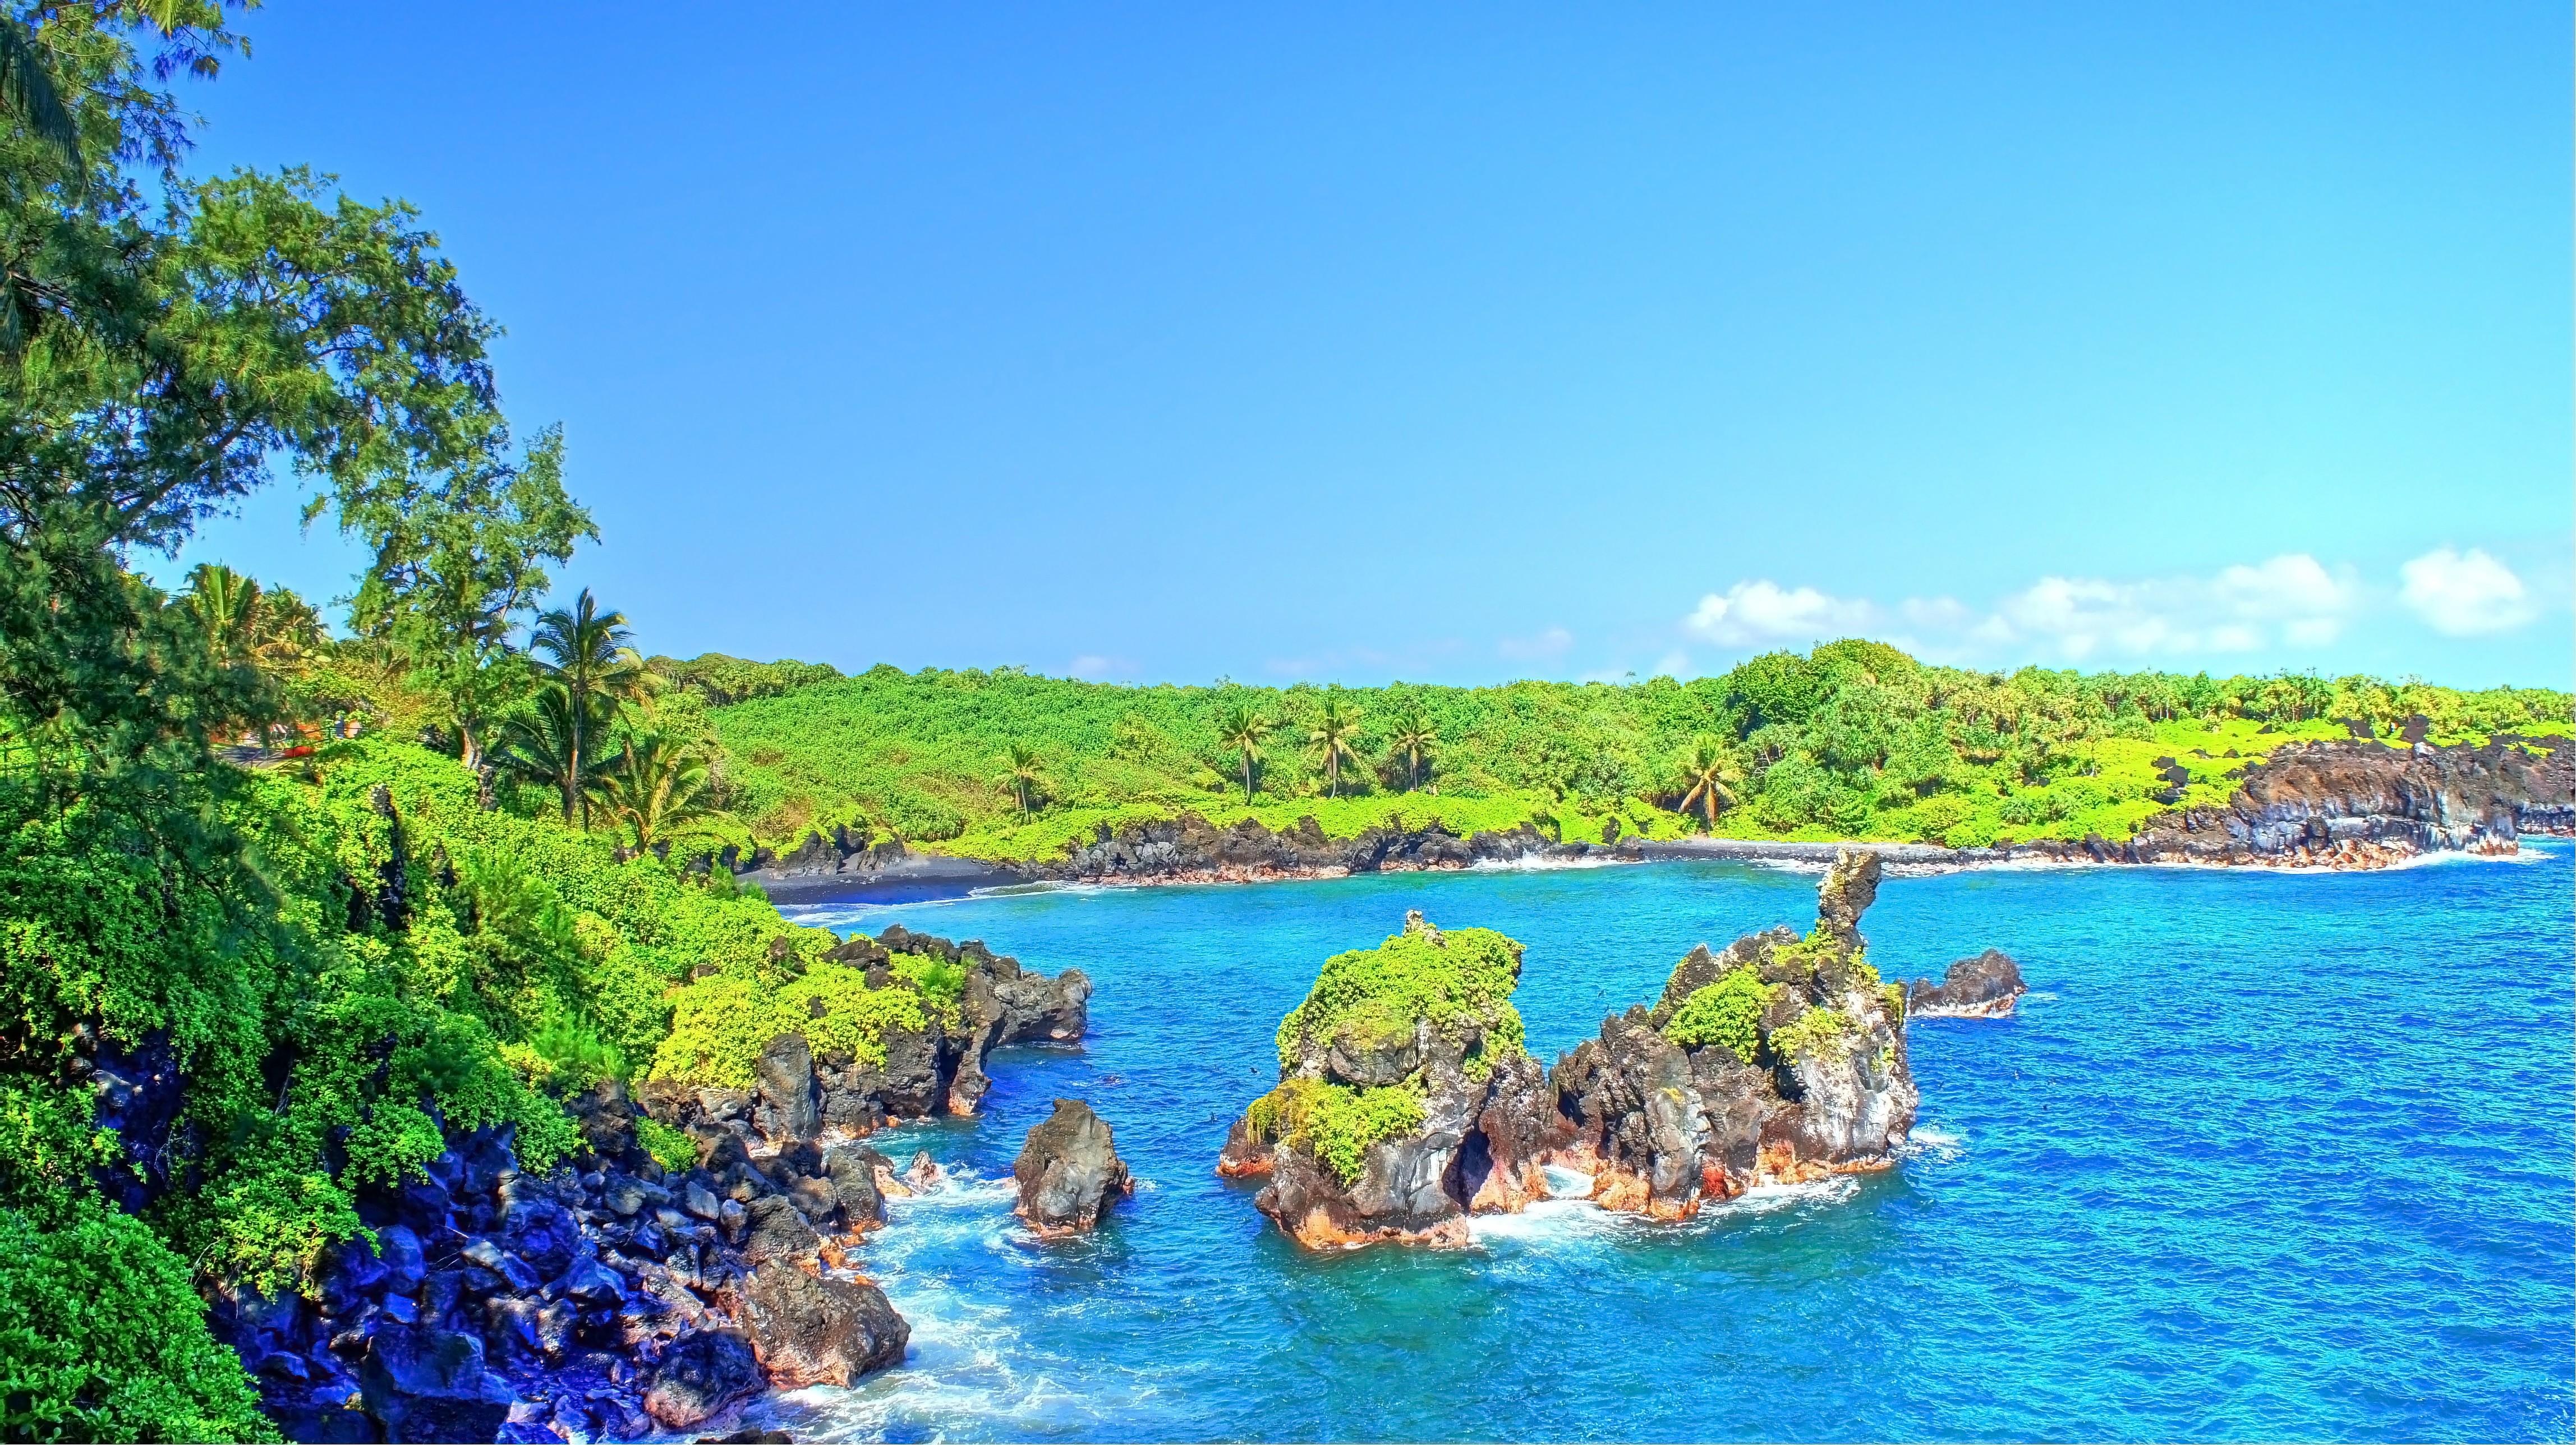 General 4592x2576 tropical water tropical forest Hawaii isle of Maui Maui palm trees beach waterfall